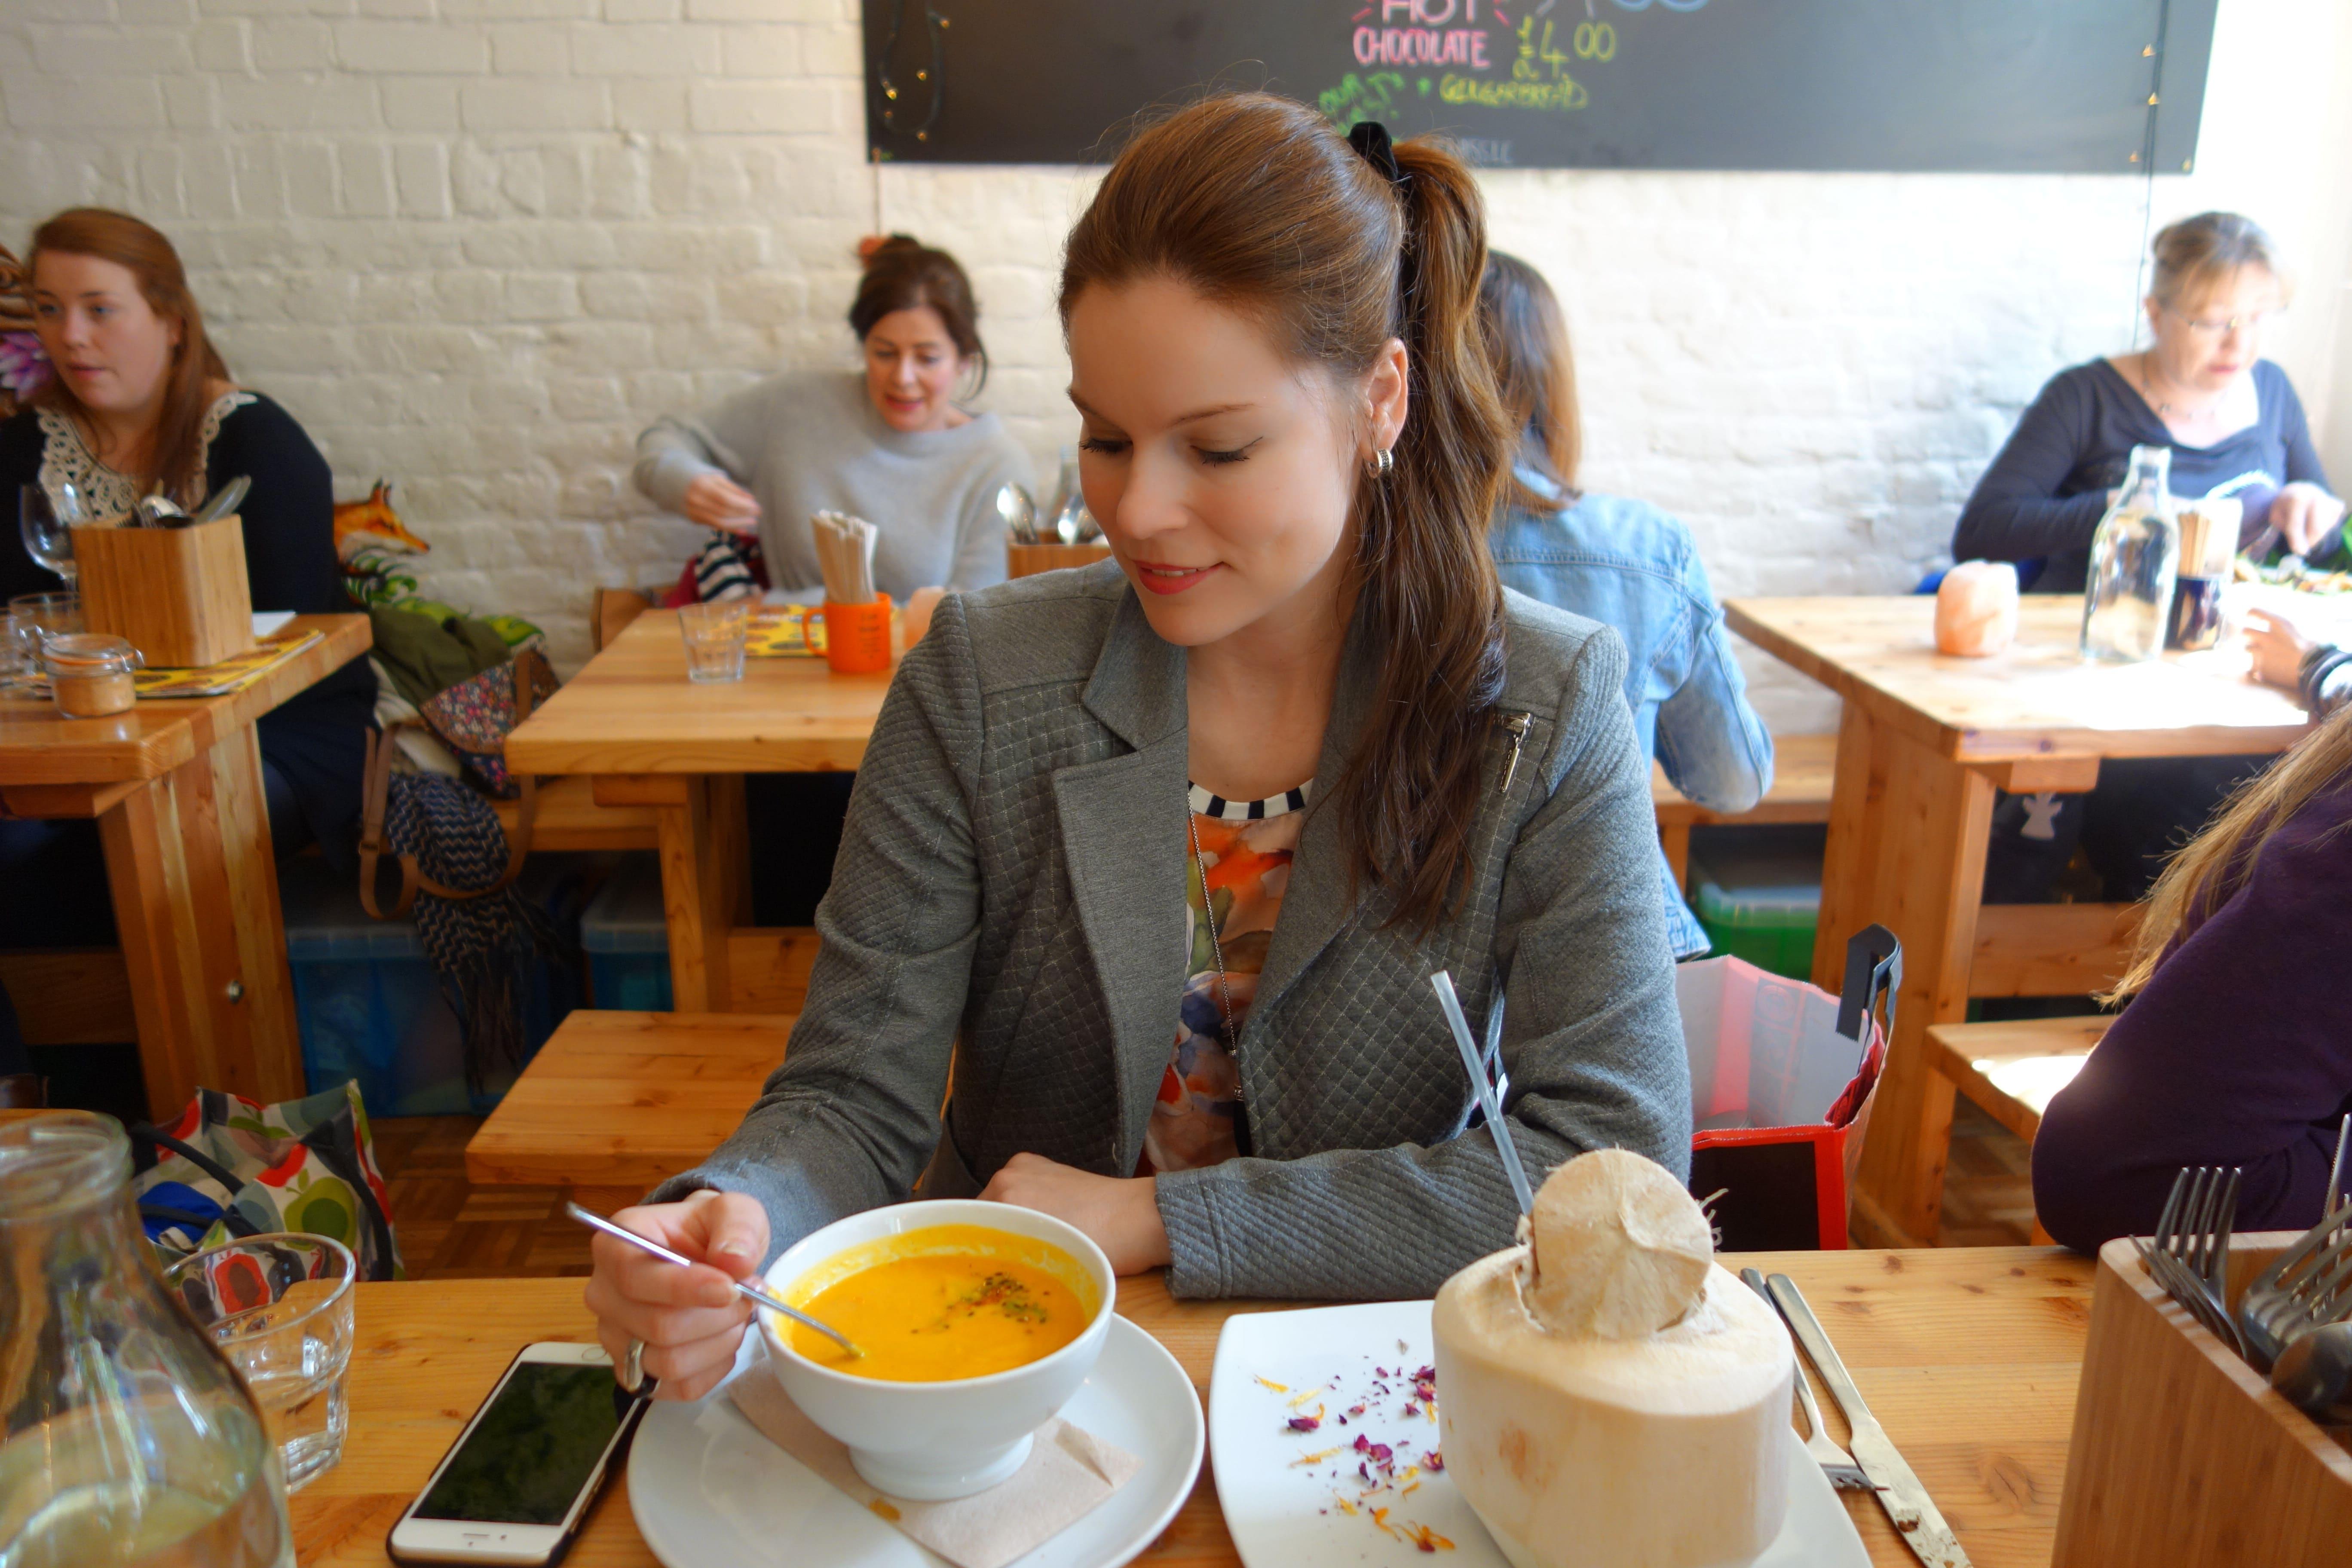 Wild Food Cafe London- The Organic Label